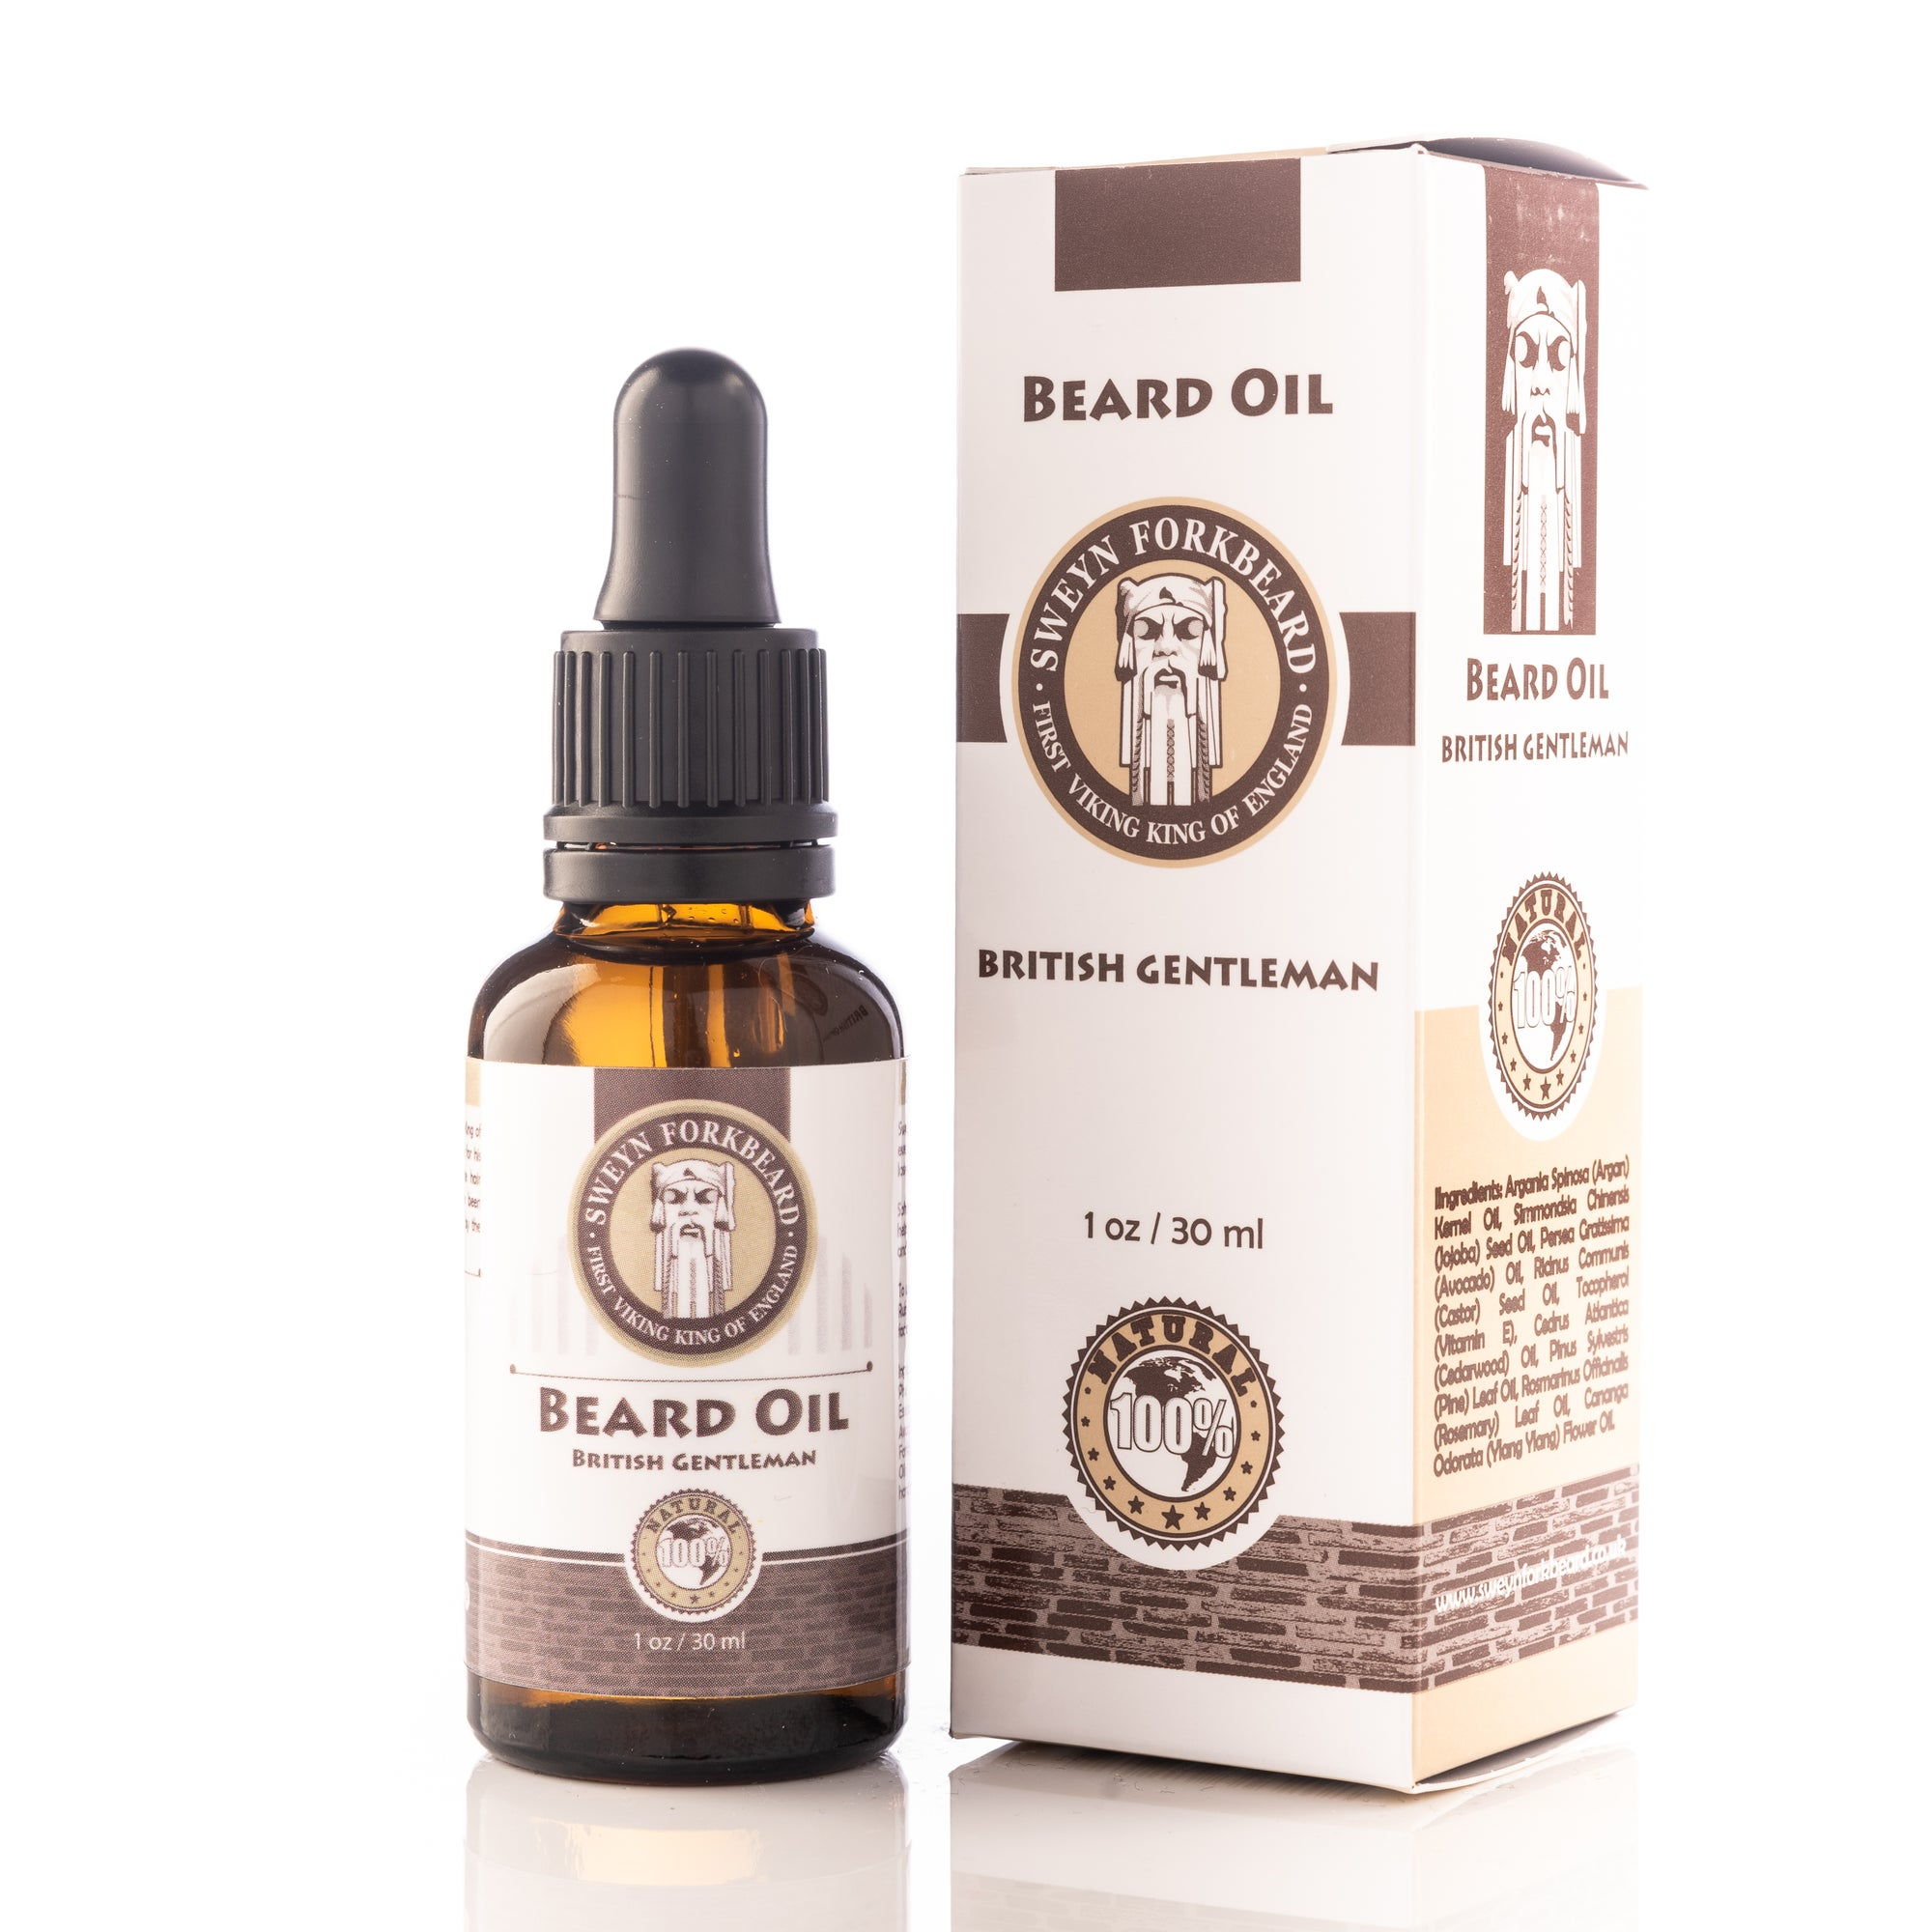 d4f0c88e Beard Oil British Gentleman 30 ml/1 oz